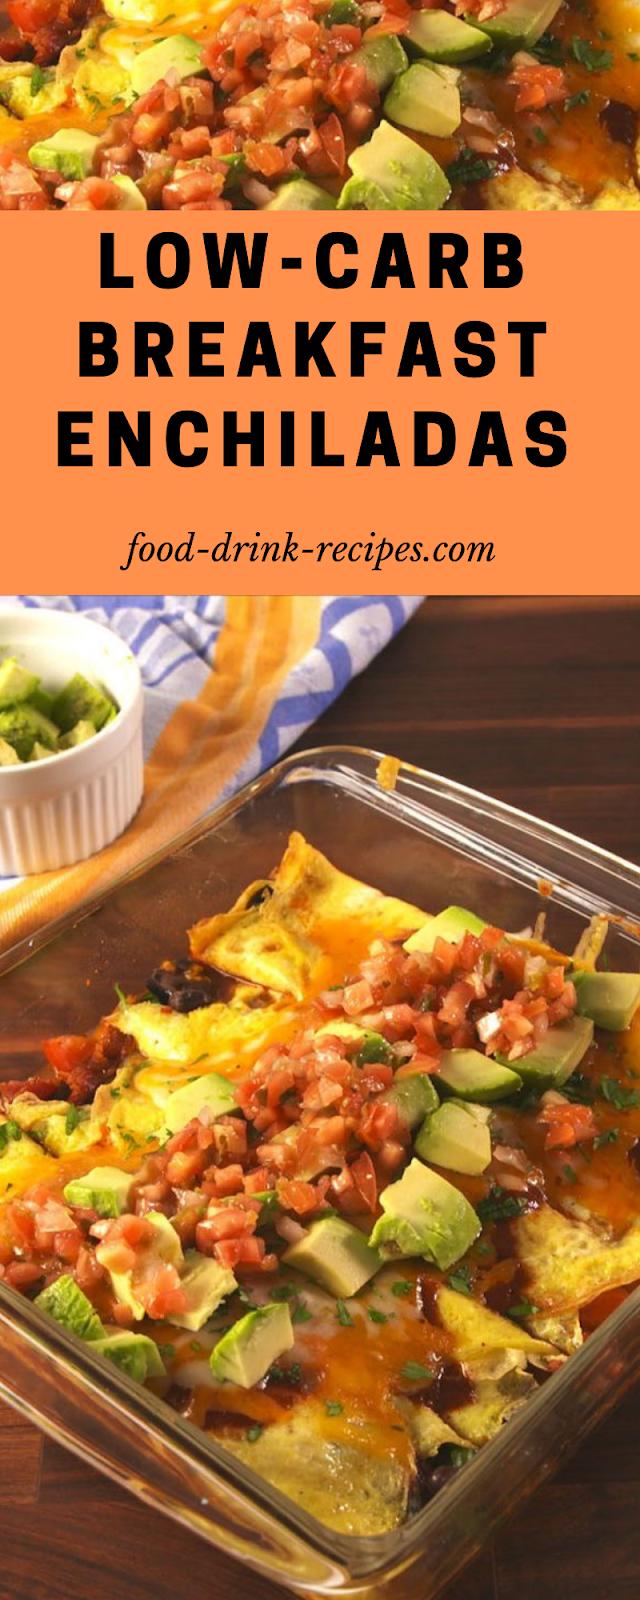 Low-Carb Breakfast Enchiladas - food-drink-recipes.com